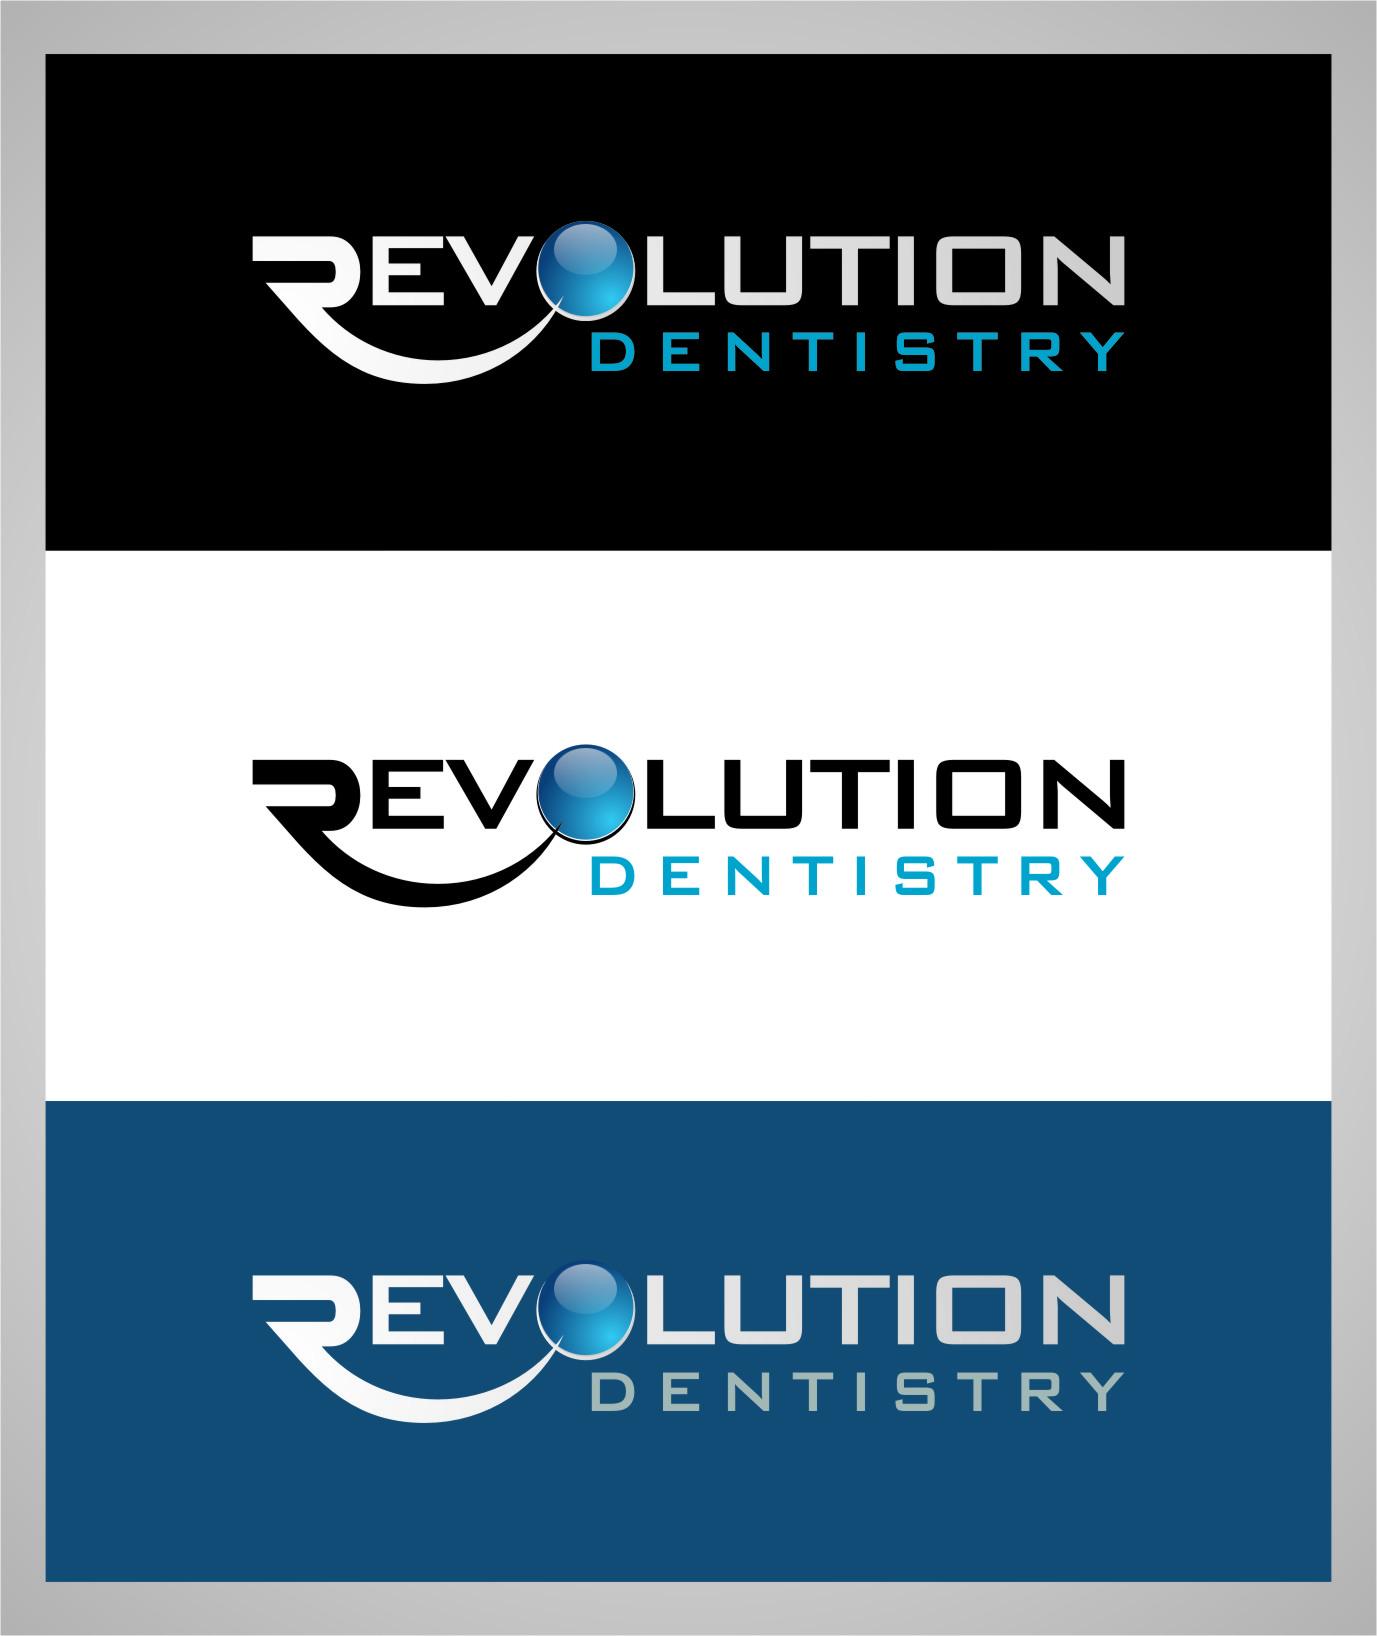 Logo Design by Ngepet_art - Entry No. 190 in the Logo Design Contest Artistic Logo Design for Revolution Dentistry.